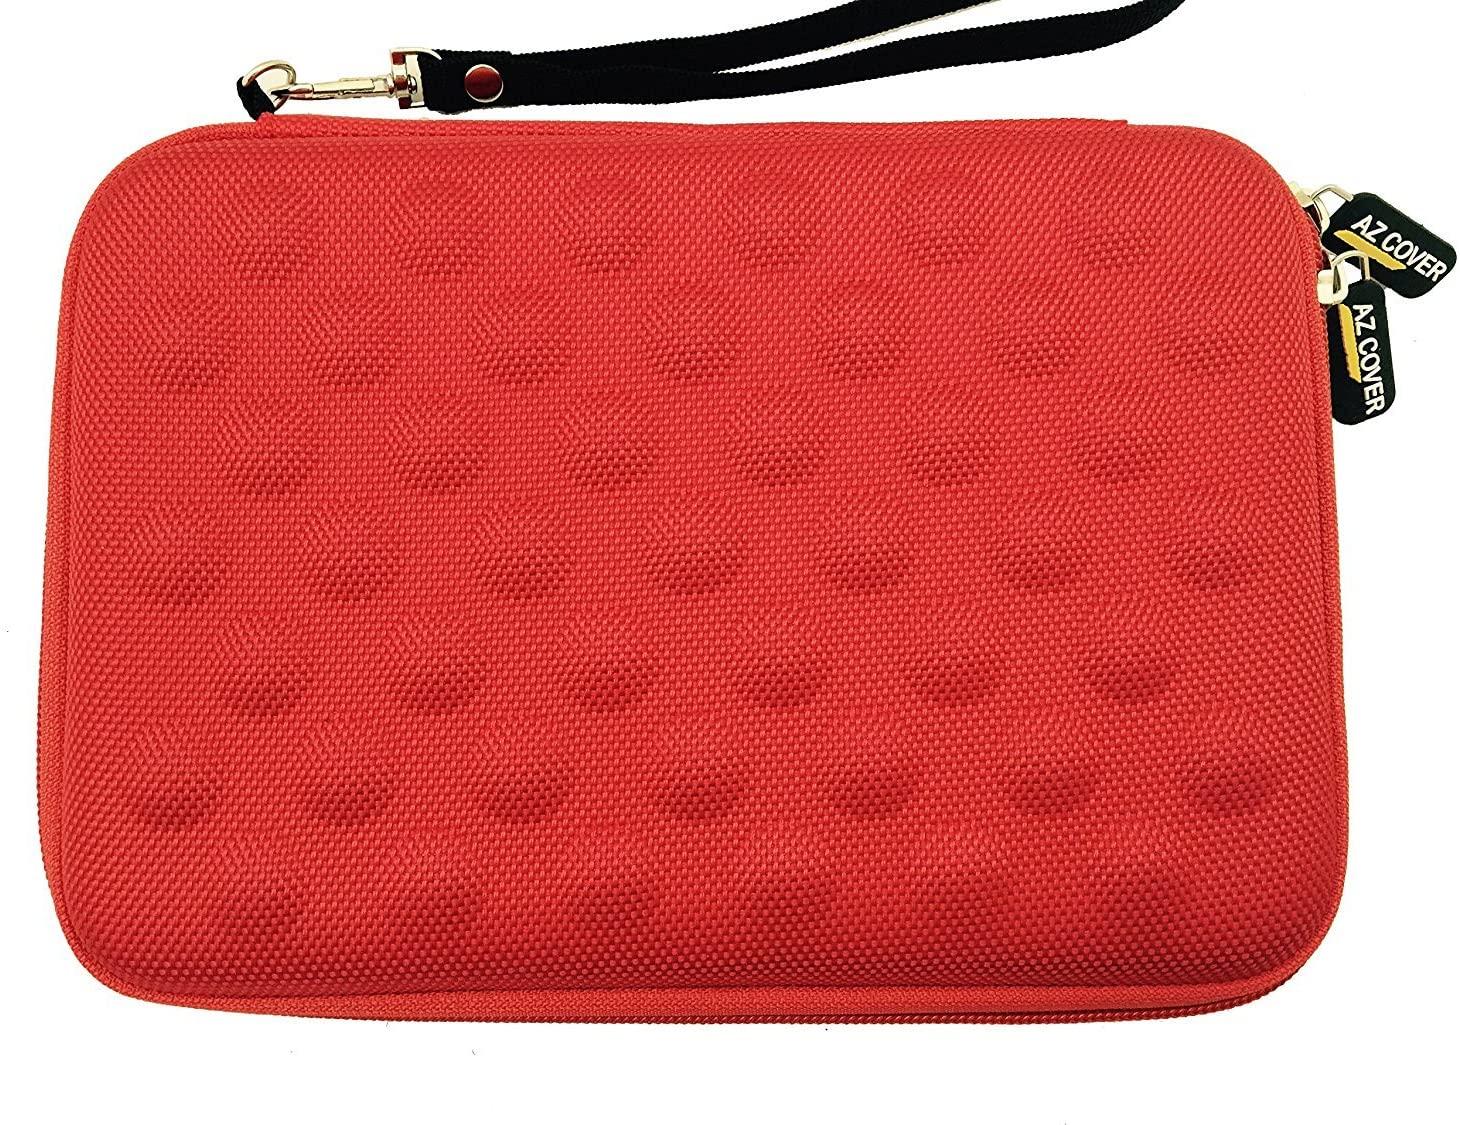 AZ-Cover 7.9-Inch Tablet Semi-rigid EVA Bubble Foam Case (Red) With Wrist Strap For Apple iPad mini Retina 7.9-inches ME278LL/A ME281LL/A MF066LL/A MF069LL/A + One Capacitive Stylus Pen